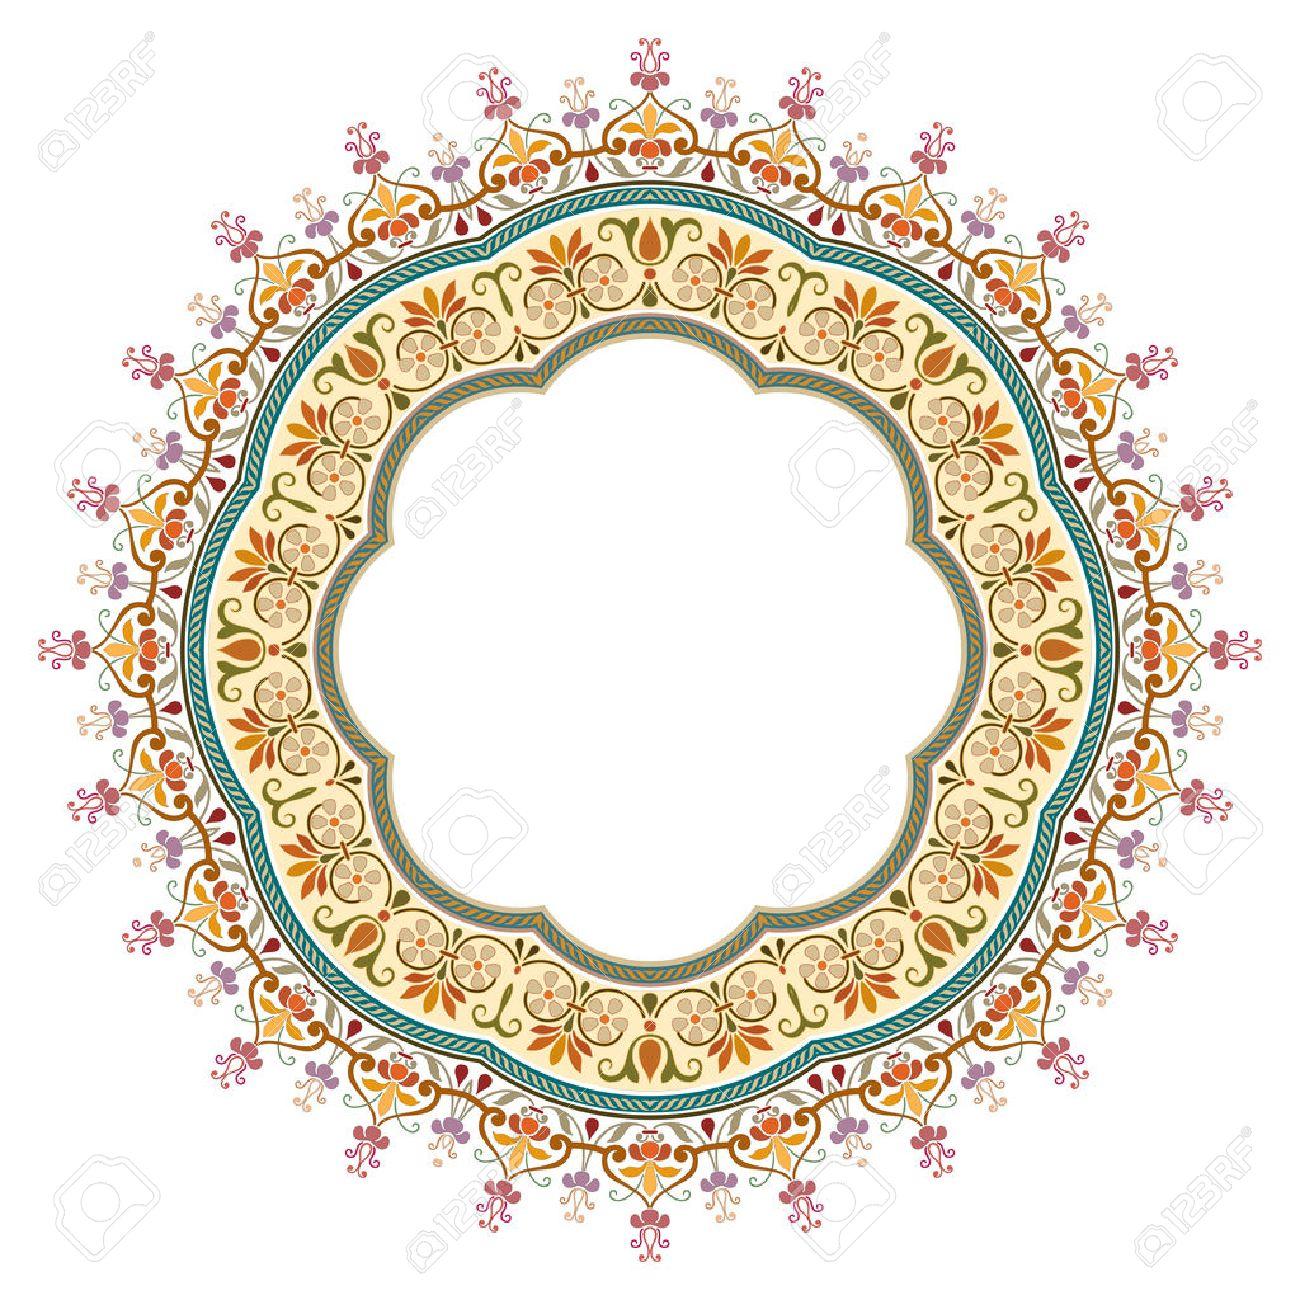 vector abstract circular pattern - frame design - 32567539